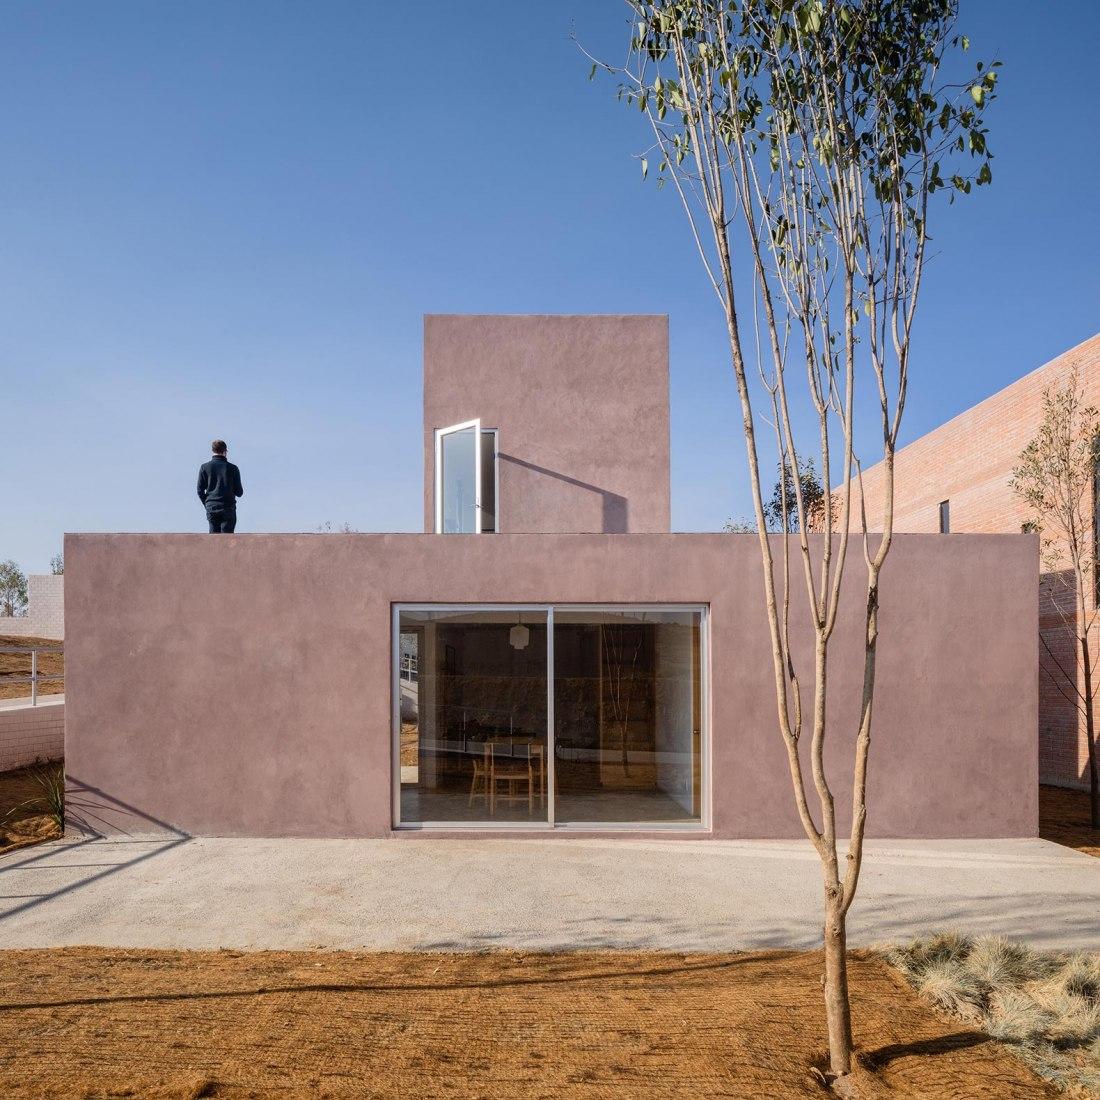 Apán housing prototype by PPAA. Photograph by Rafael Gamo